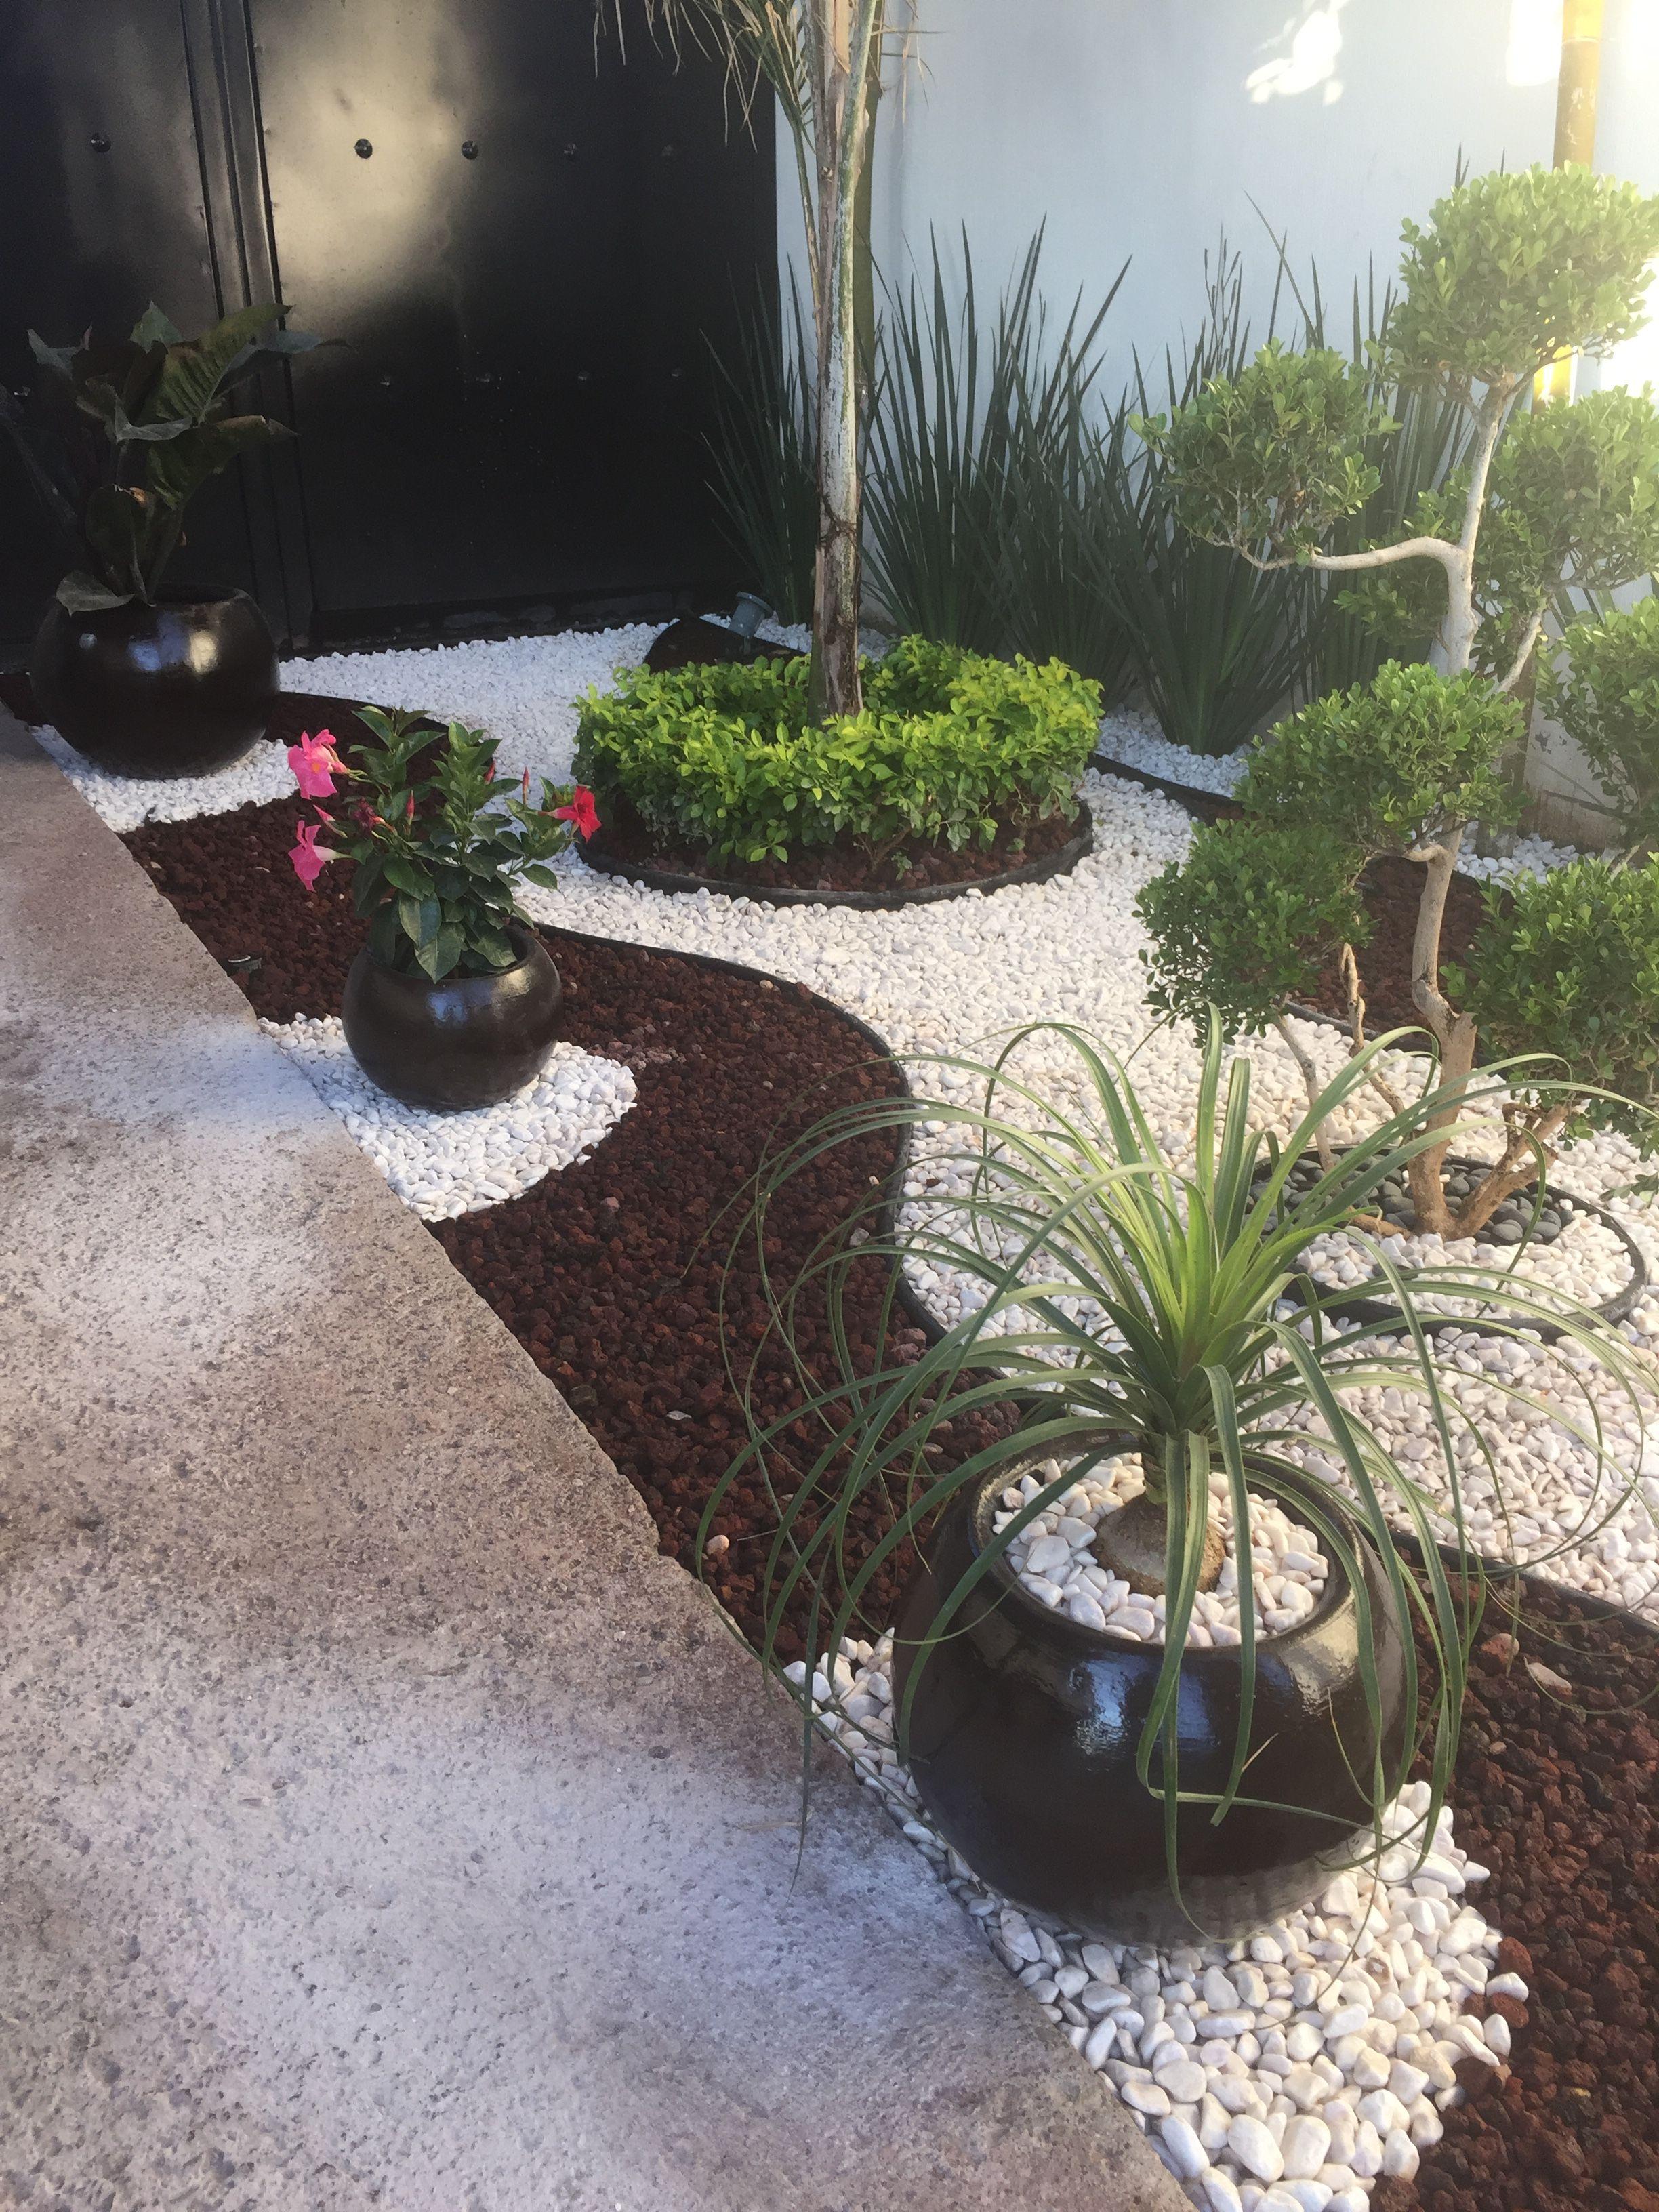 Pin by Jody Stewart on My New Home | Zen garden design ... on Zen Front Yard Ideas id=89489